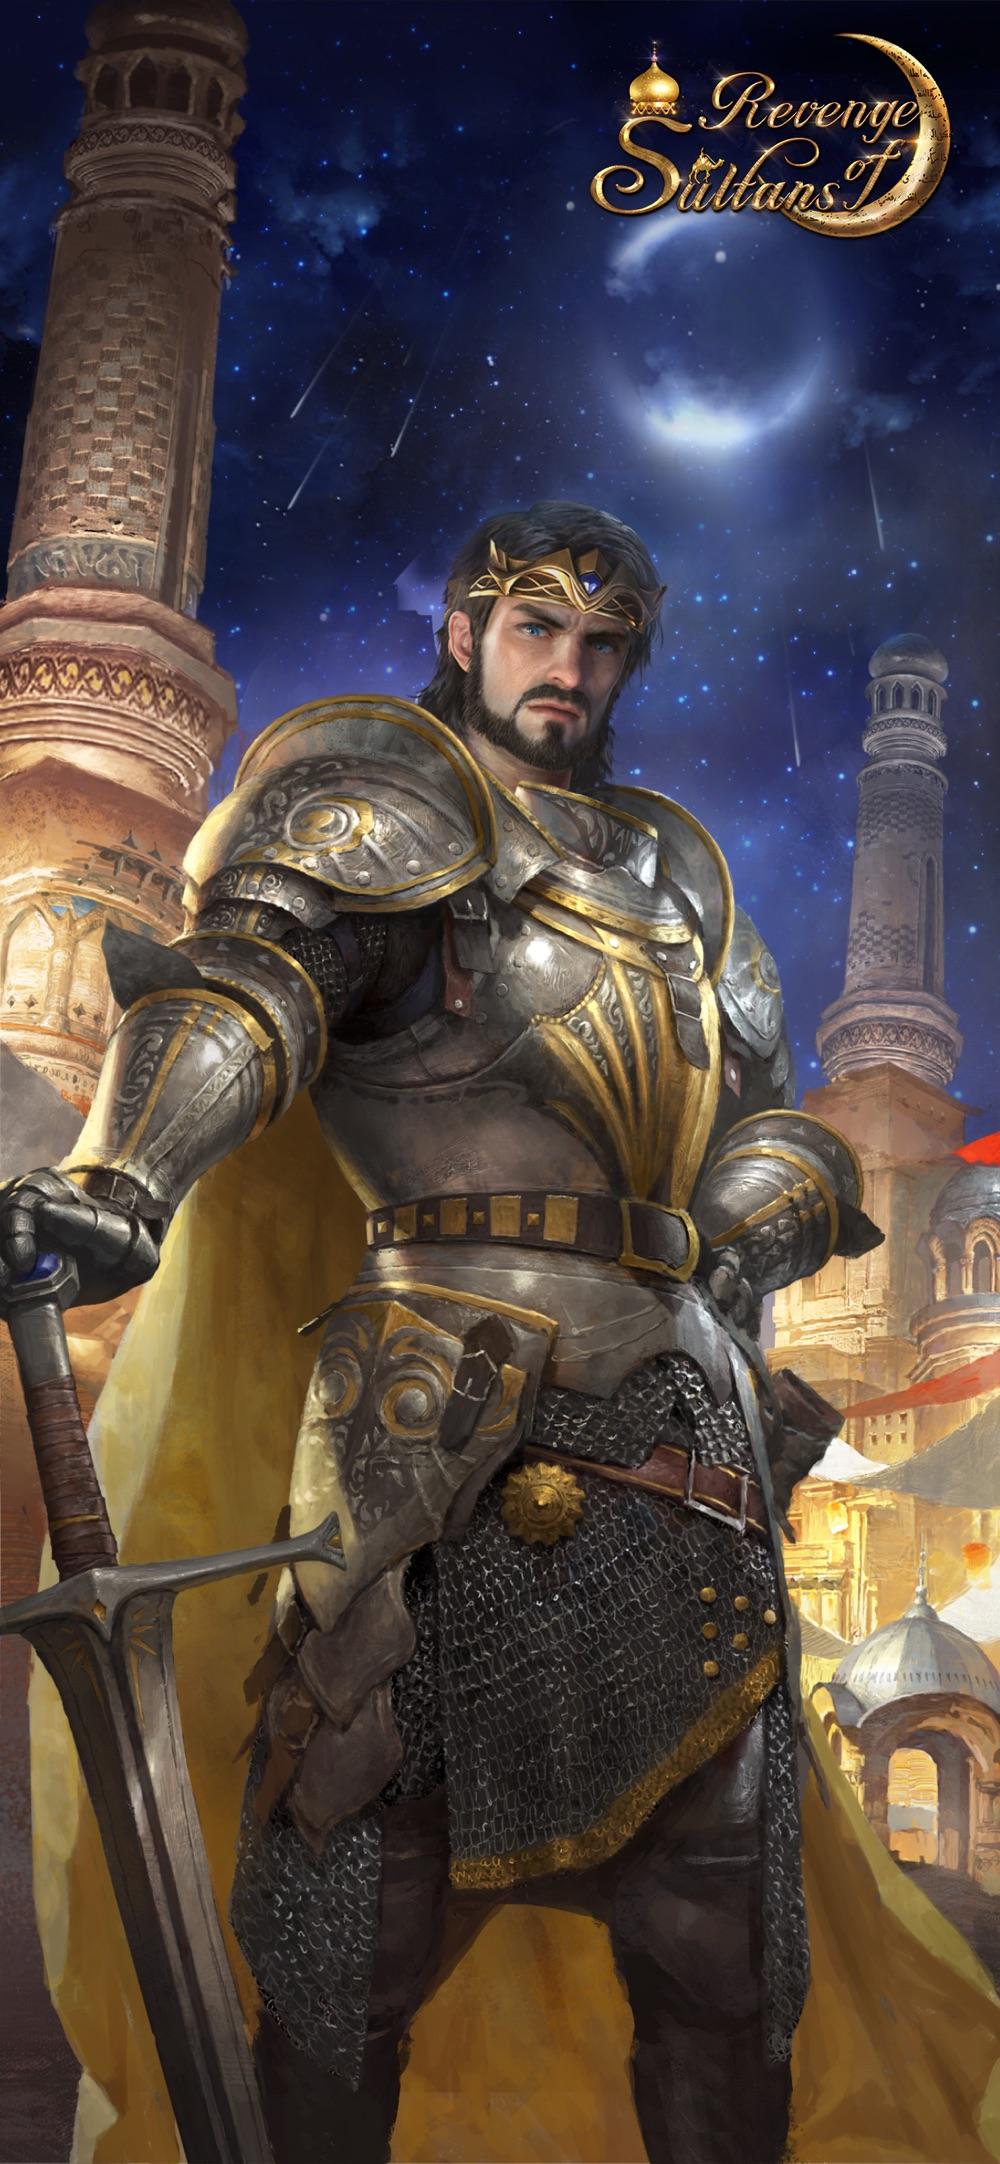 Revenge of Sultans Cheat Codes